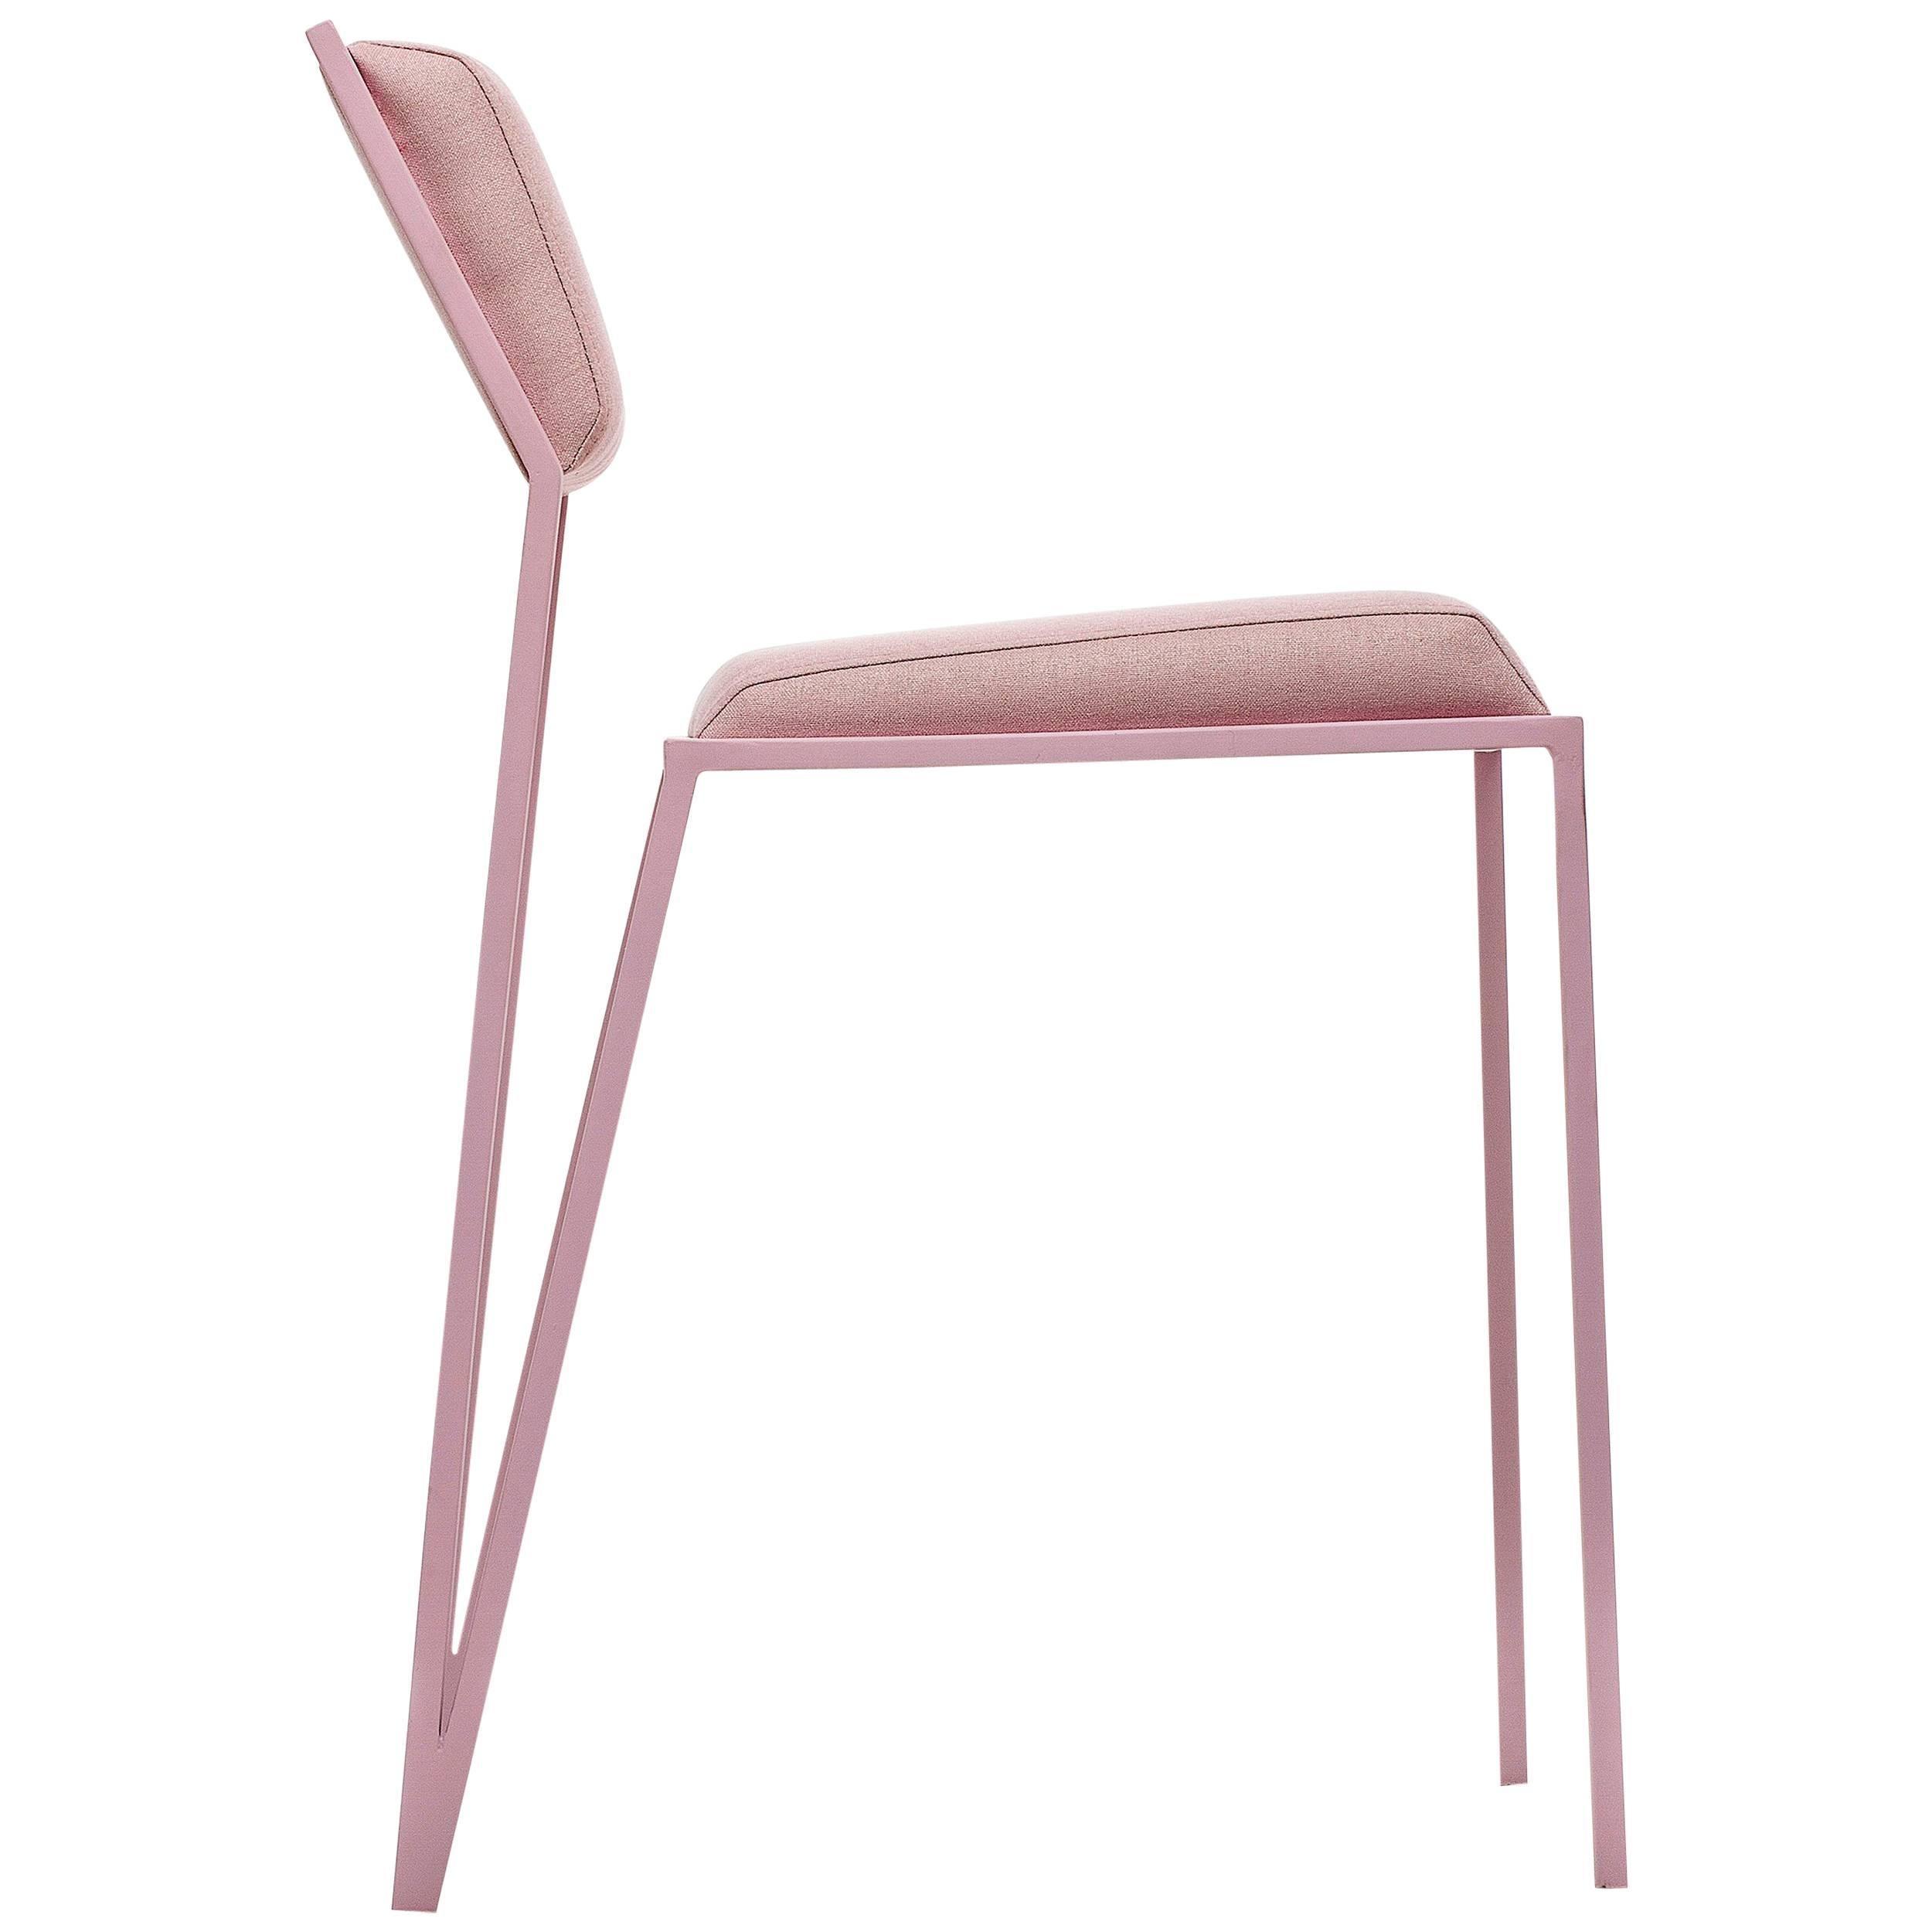 Minimalist Chair In Steel, Brazilian Contemporary Style